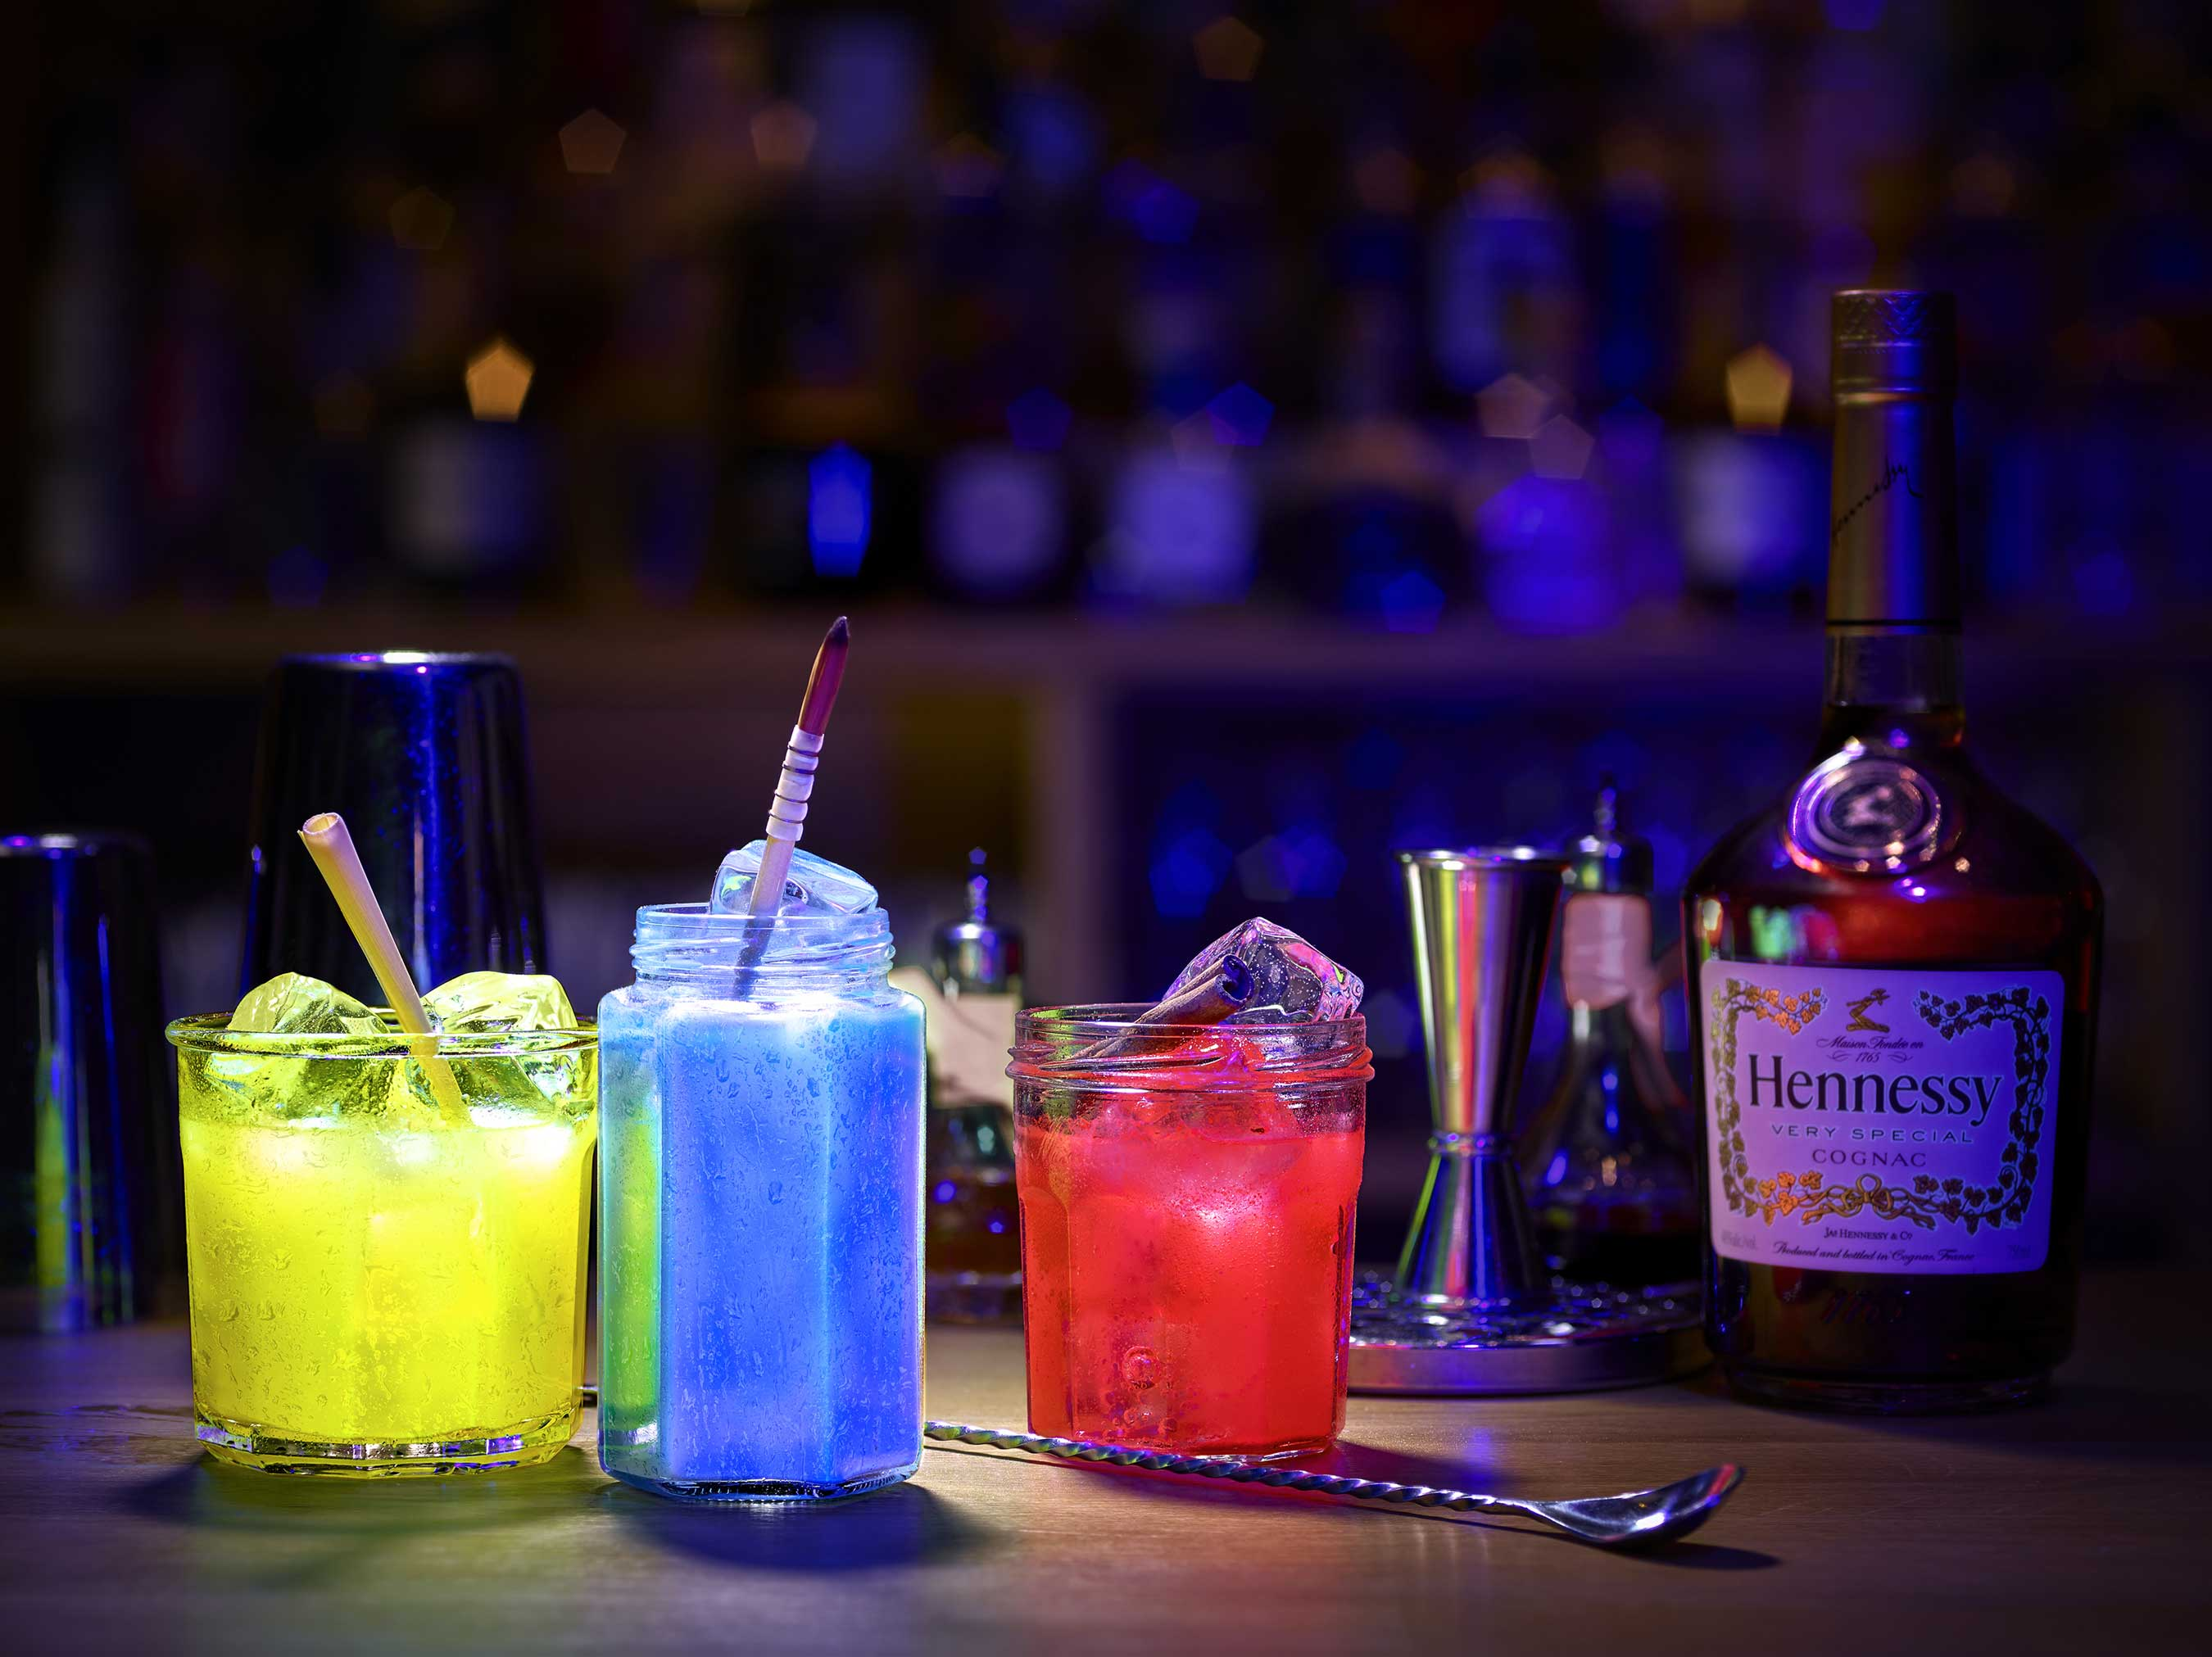 V.S Limited Edition Inspired Cocktails